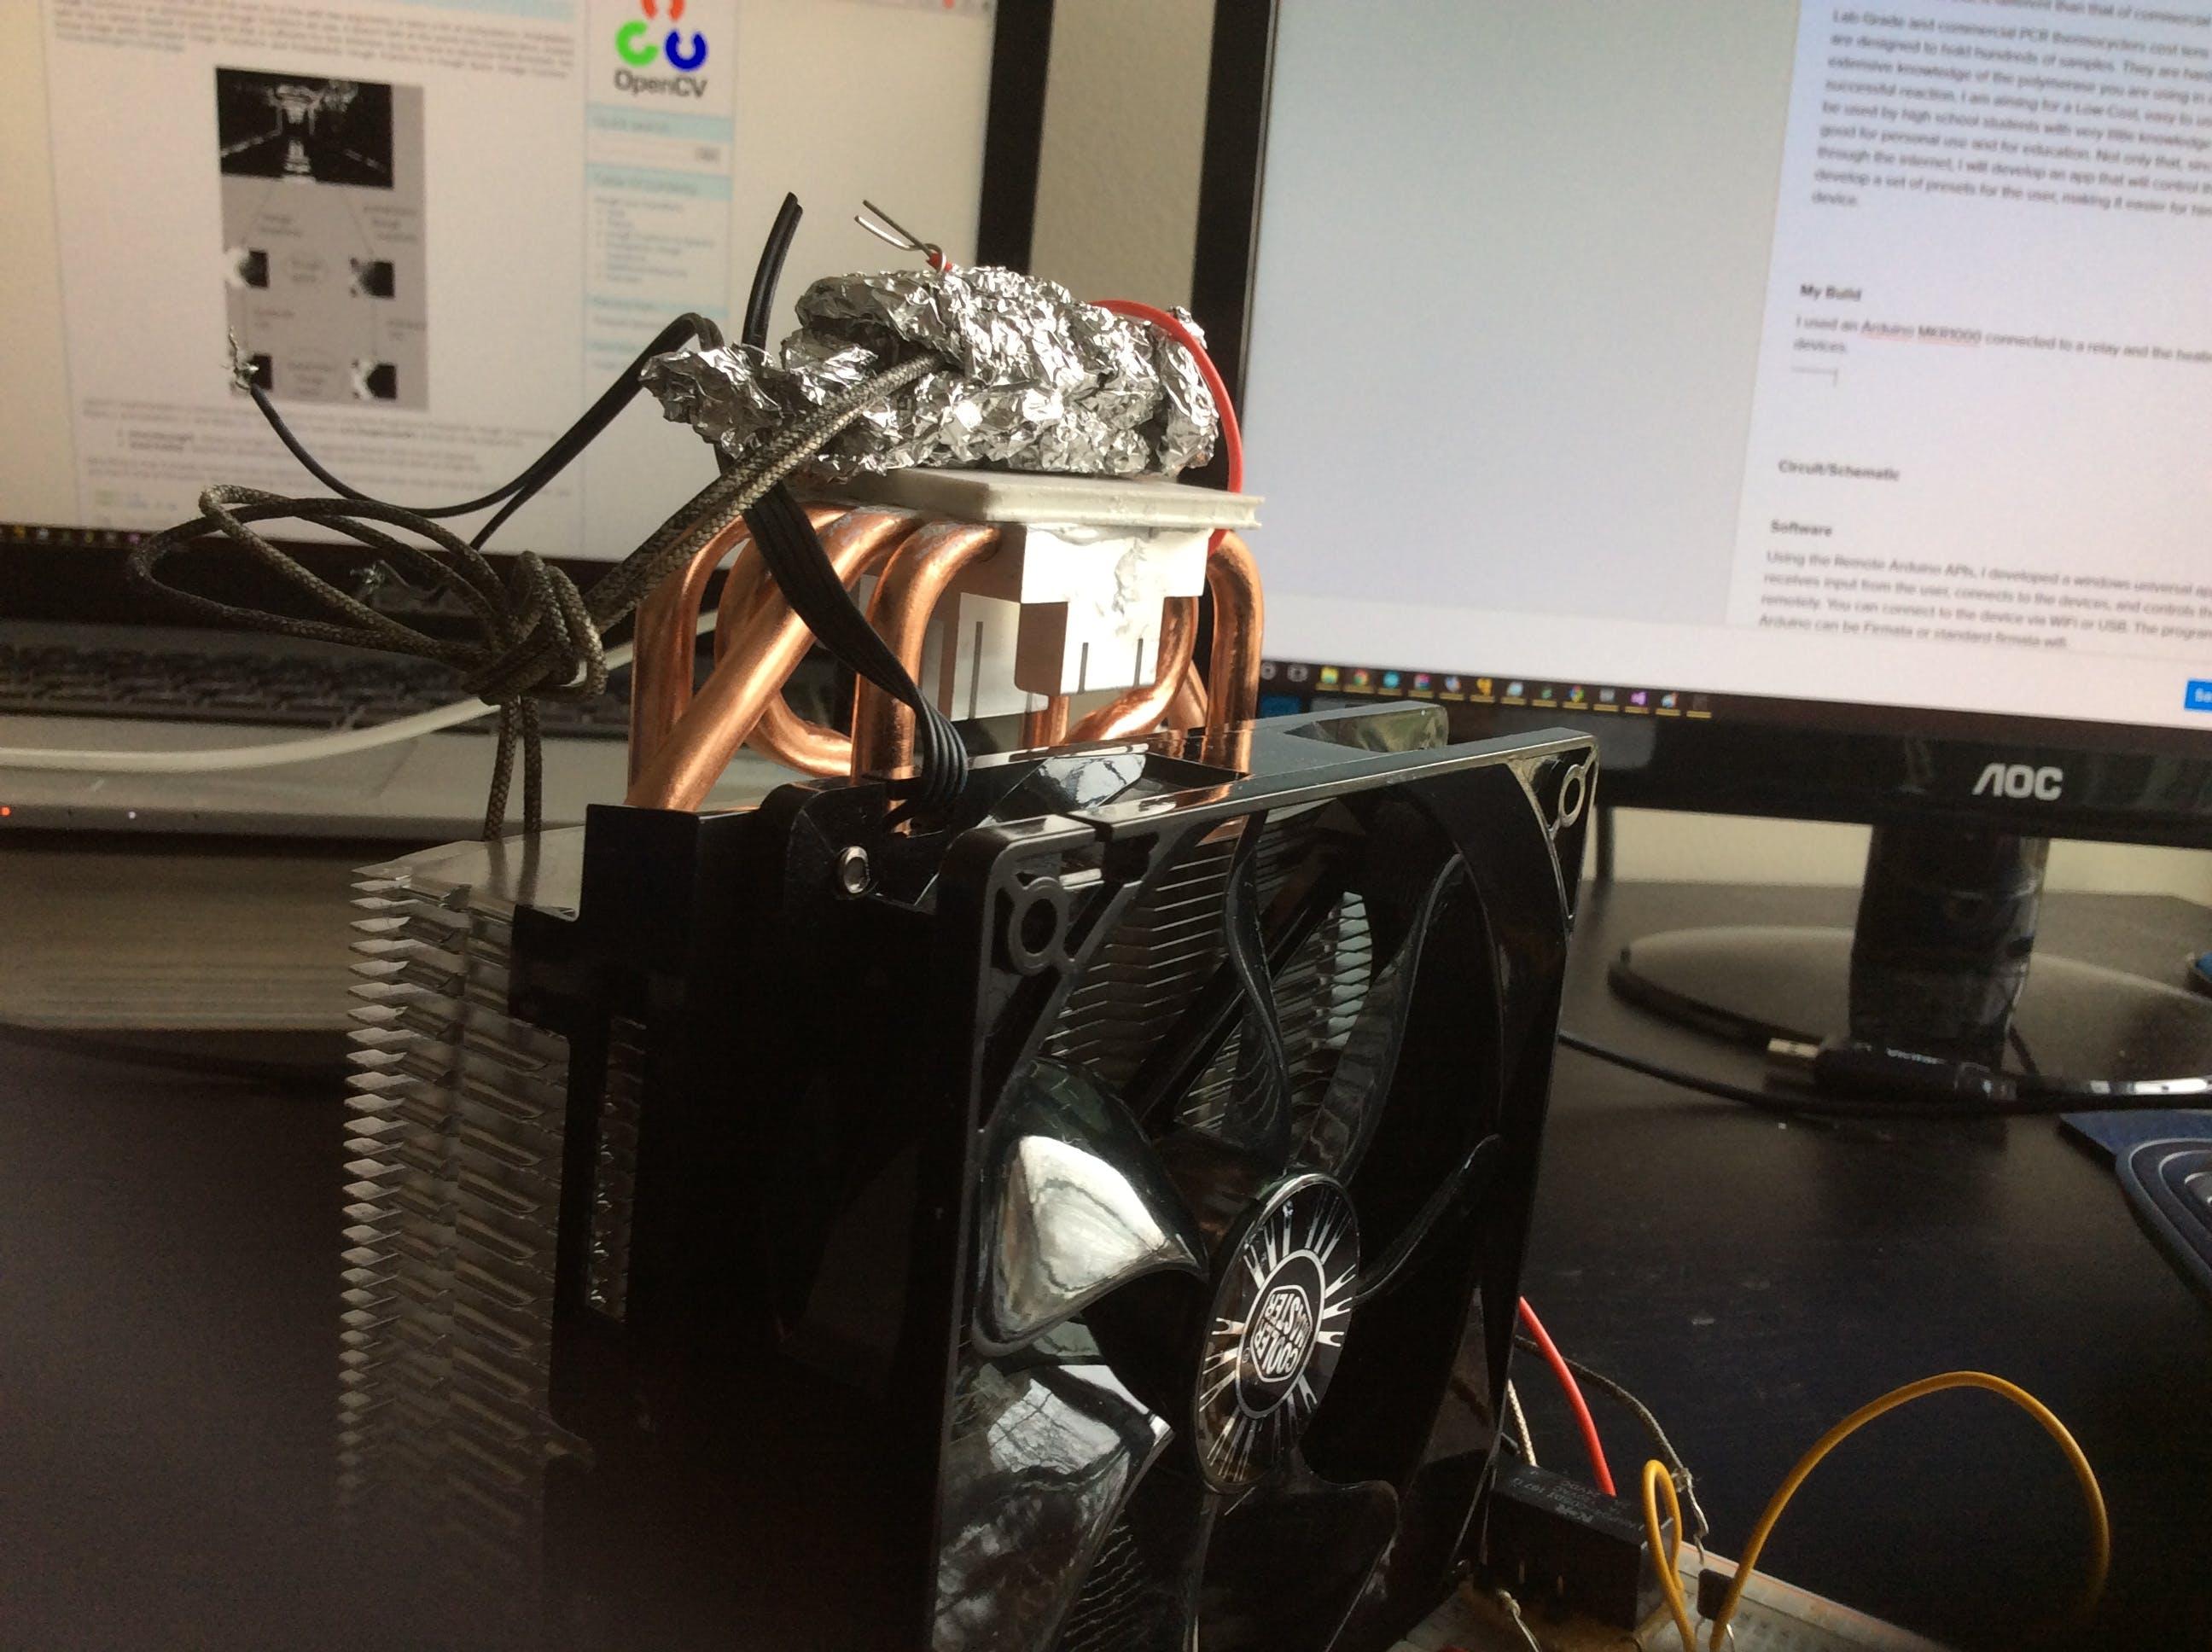 Peltier, sample holder(tin foil), CPU cooler, and temp sensor